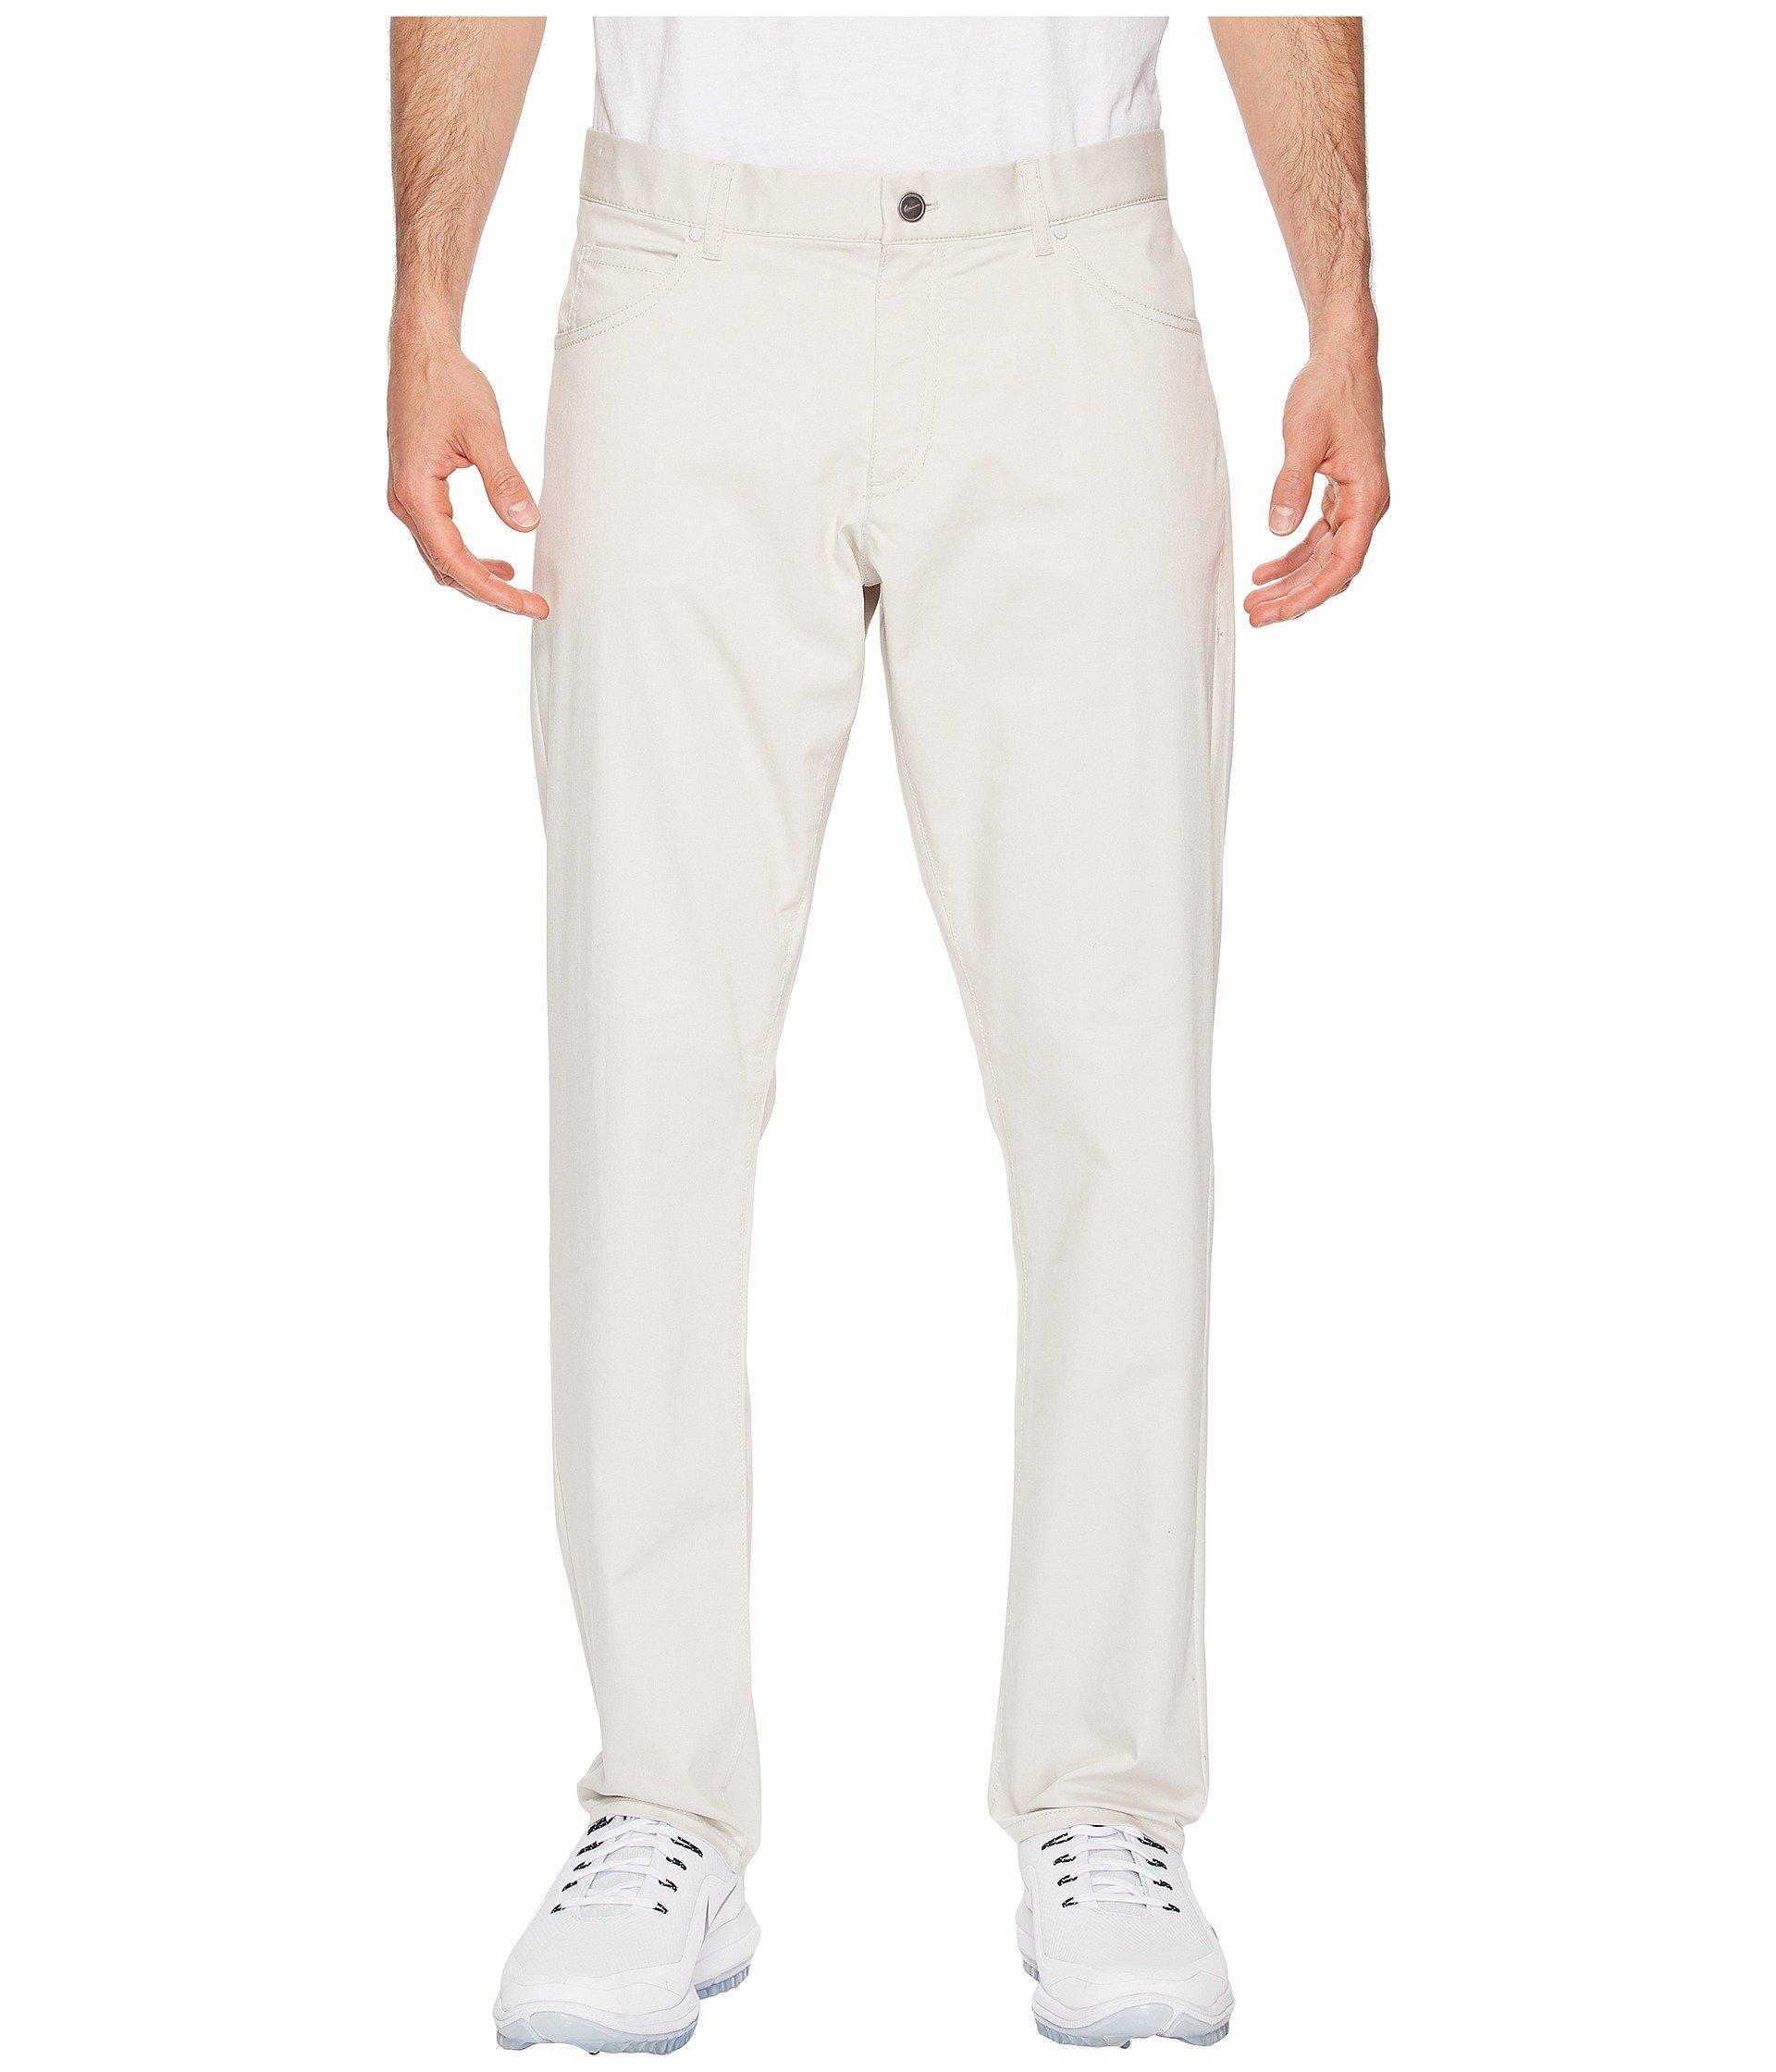 NIKE Men's Flex Slim 5-Pocket Golf Pants, Light Bone/White, Size 35/30 by Nike